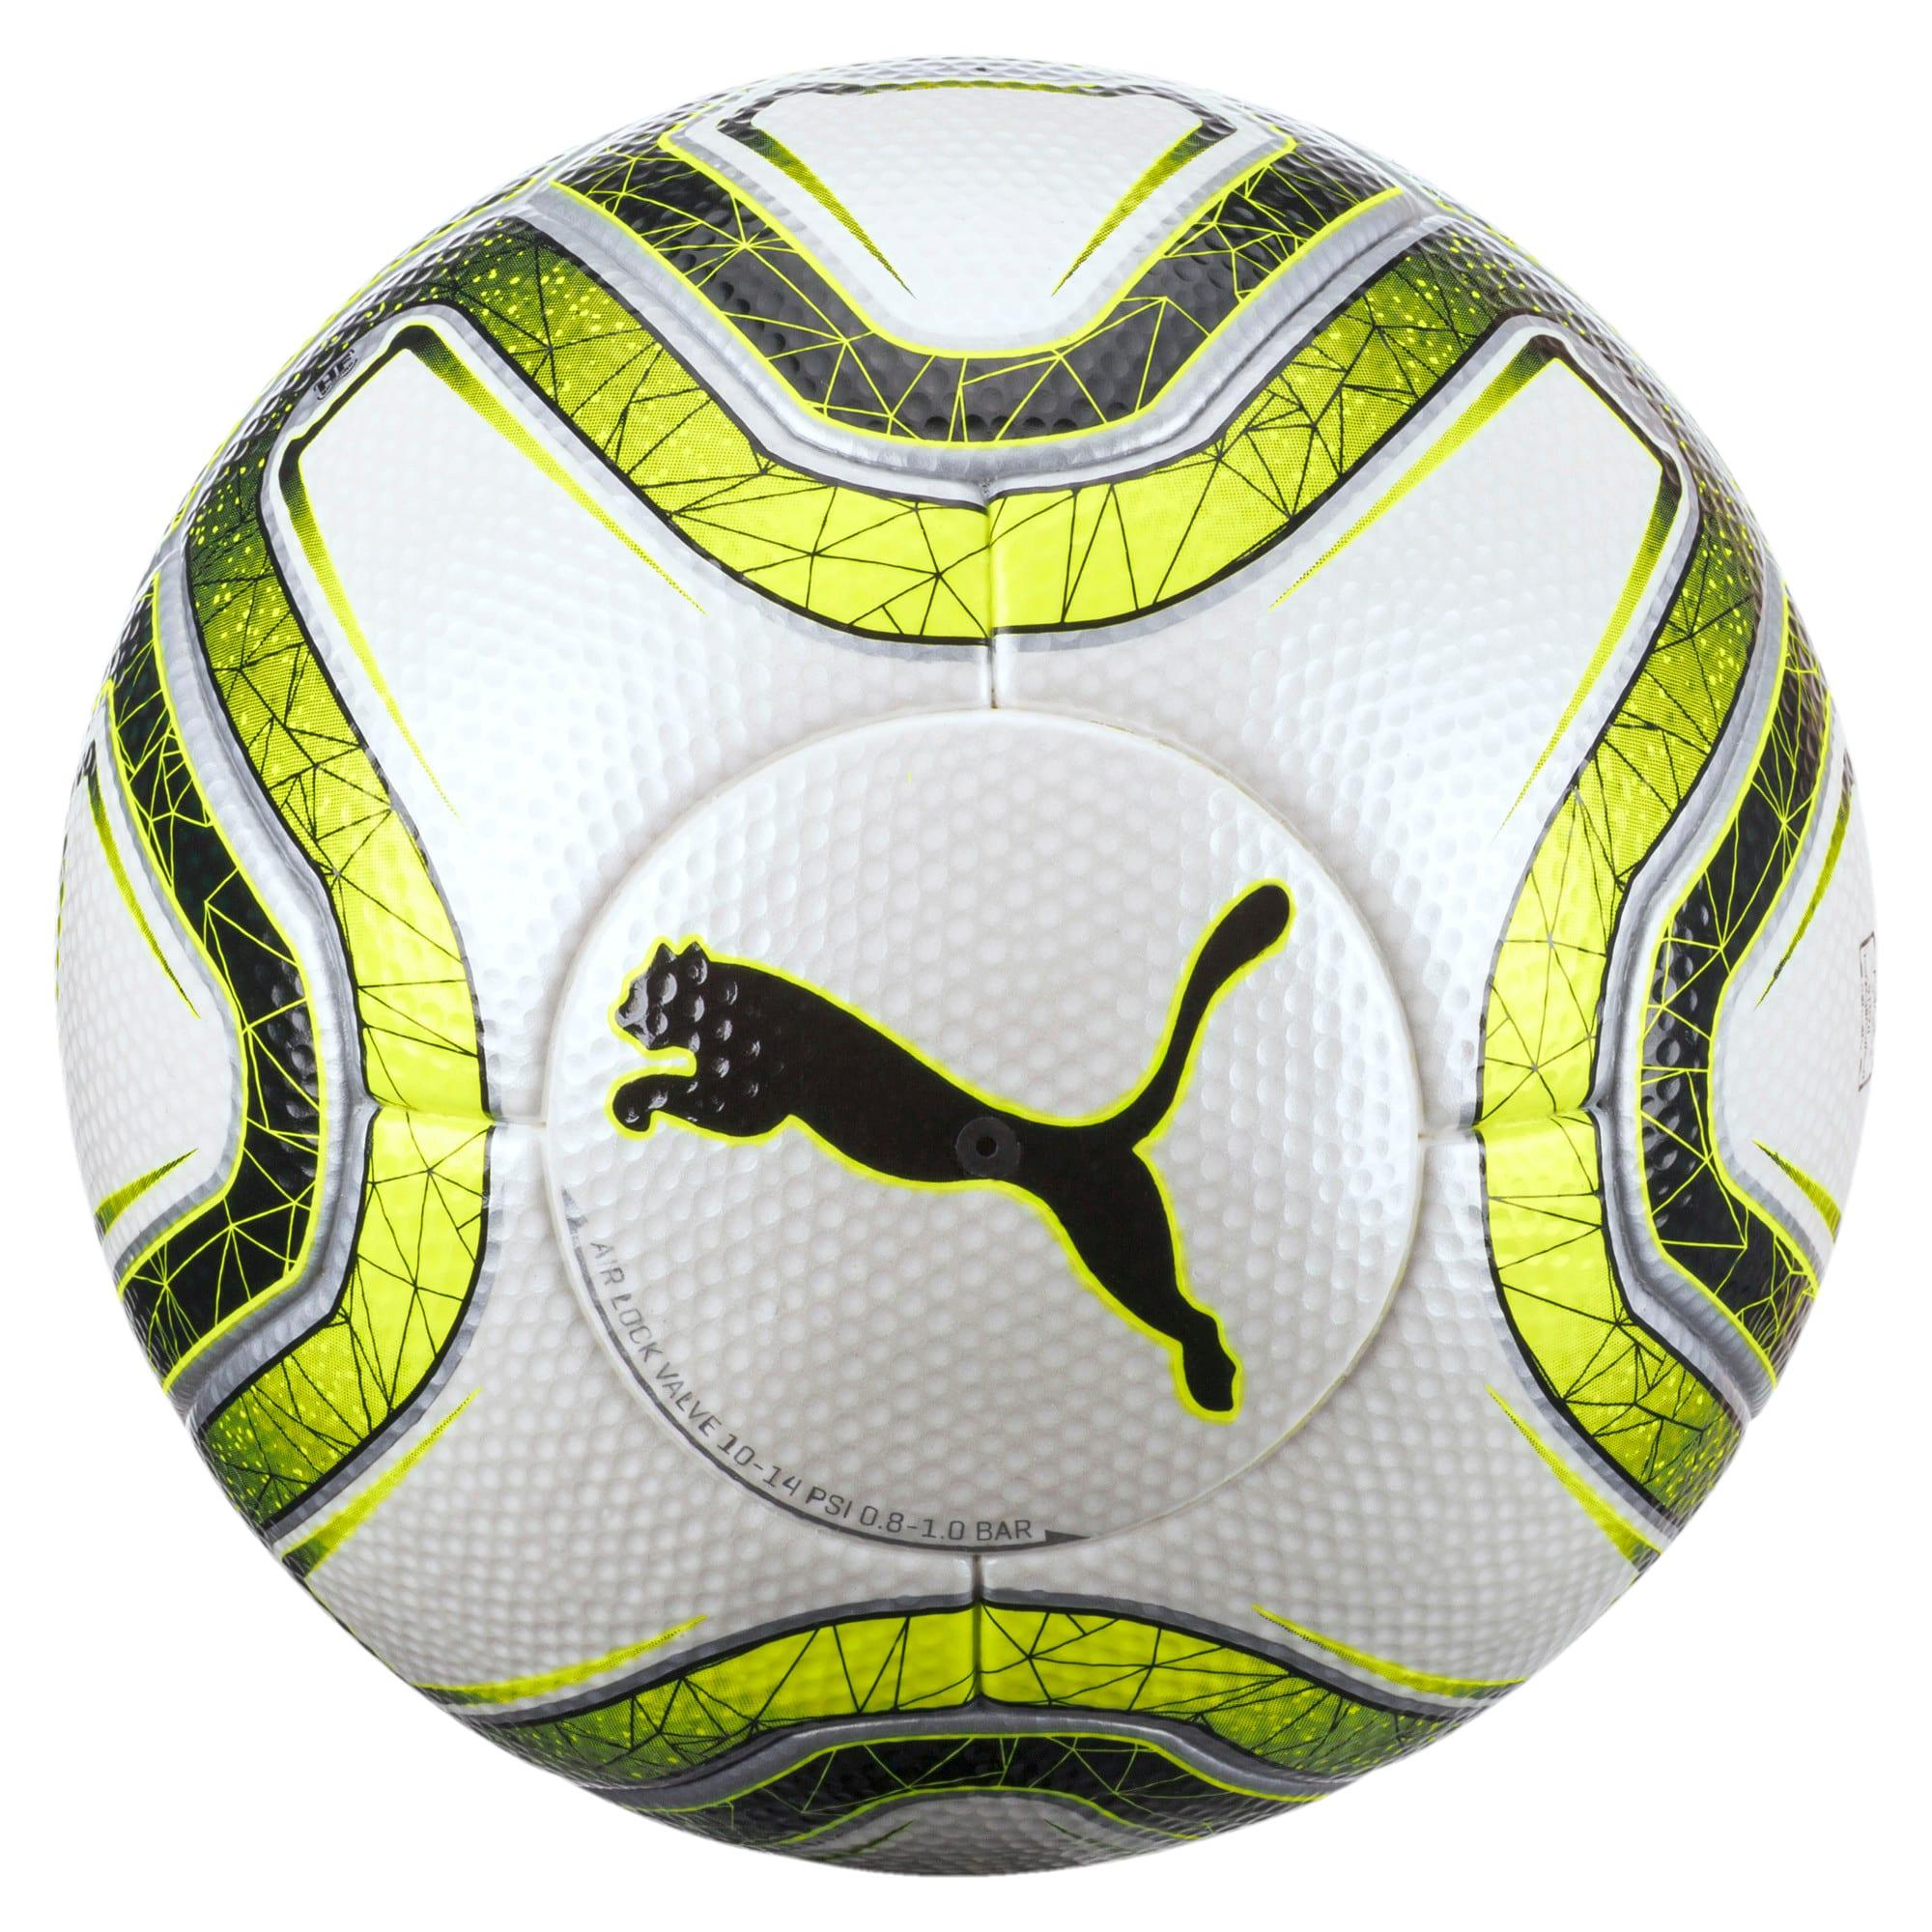 Thumbnail 2 of FINAL 1 Statement FIFA Q Pro Match Soccer, White-Lemon Tonic-Black, medium